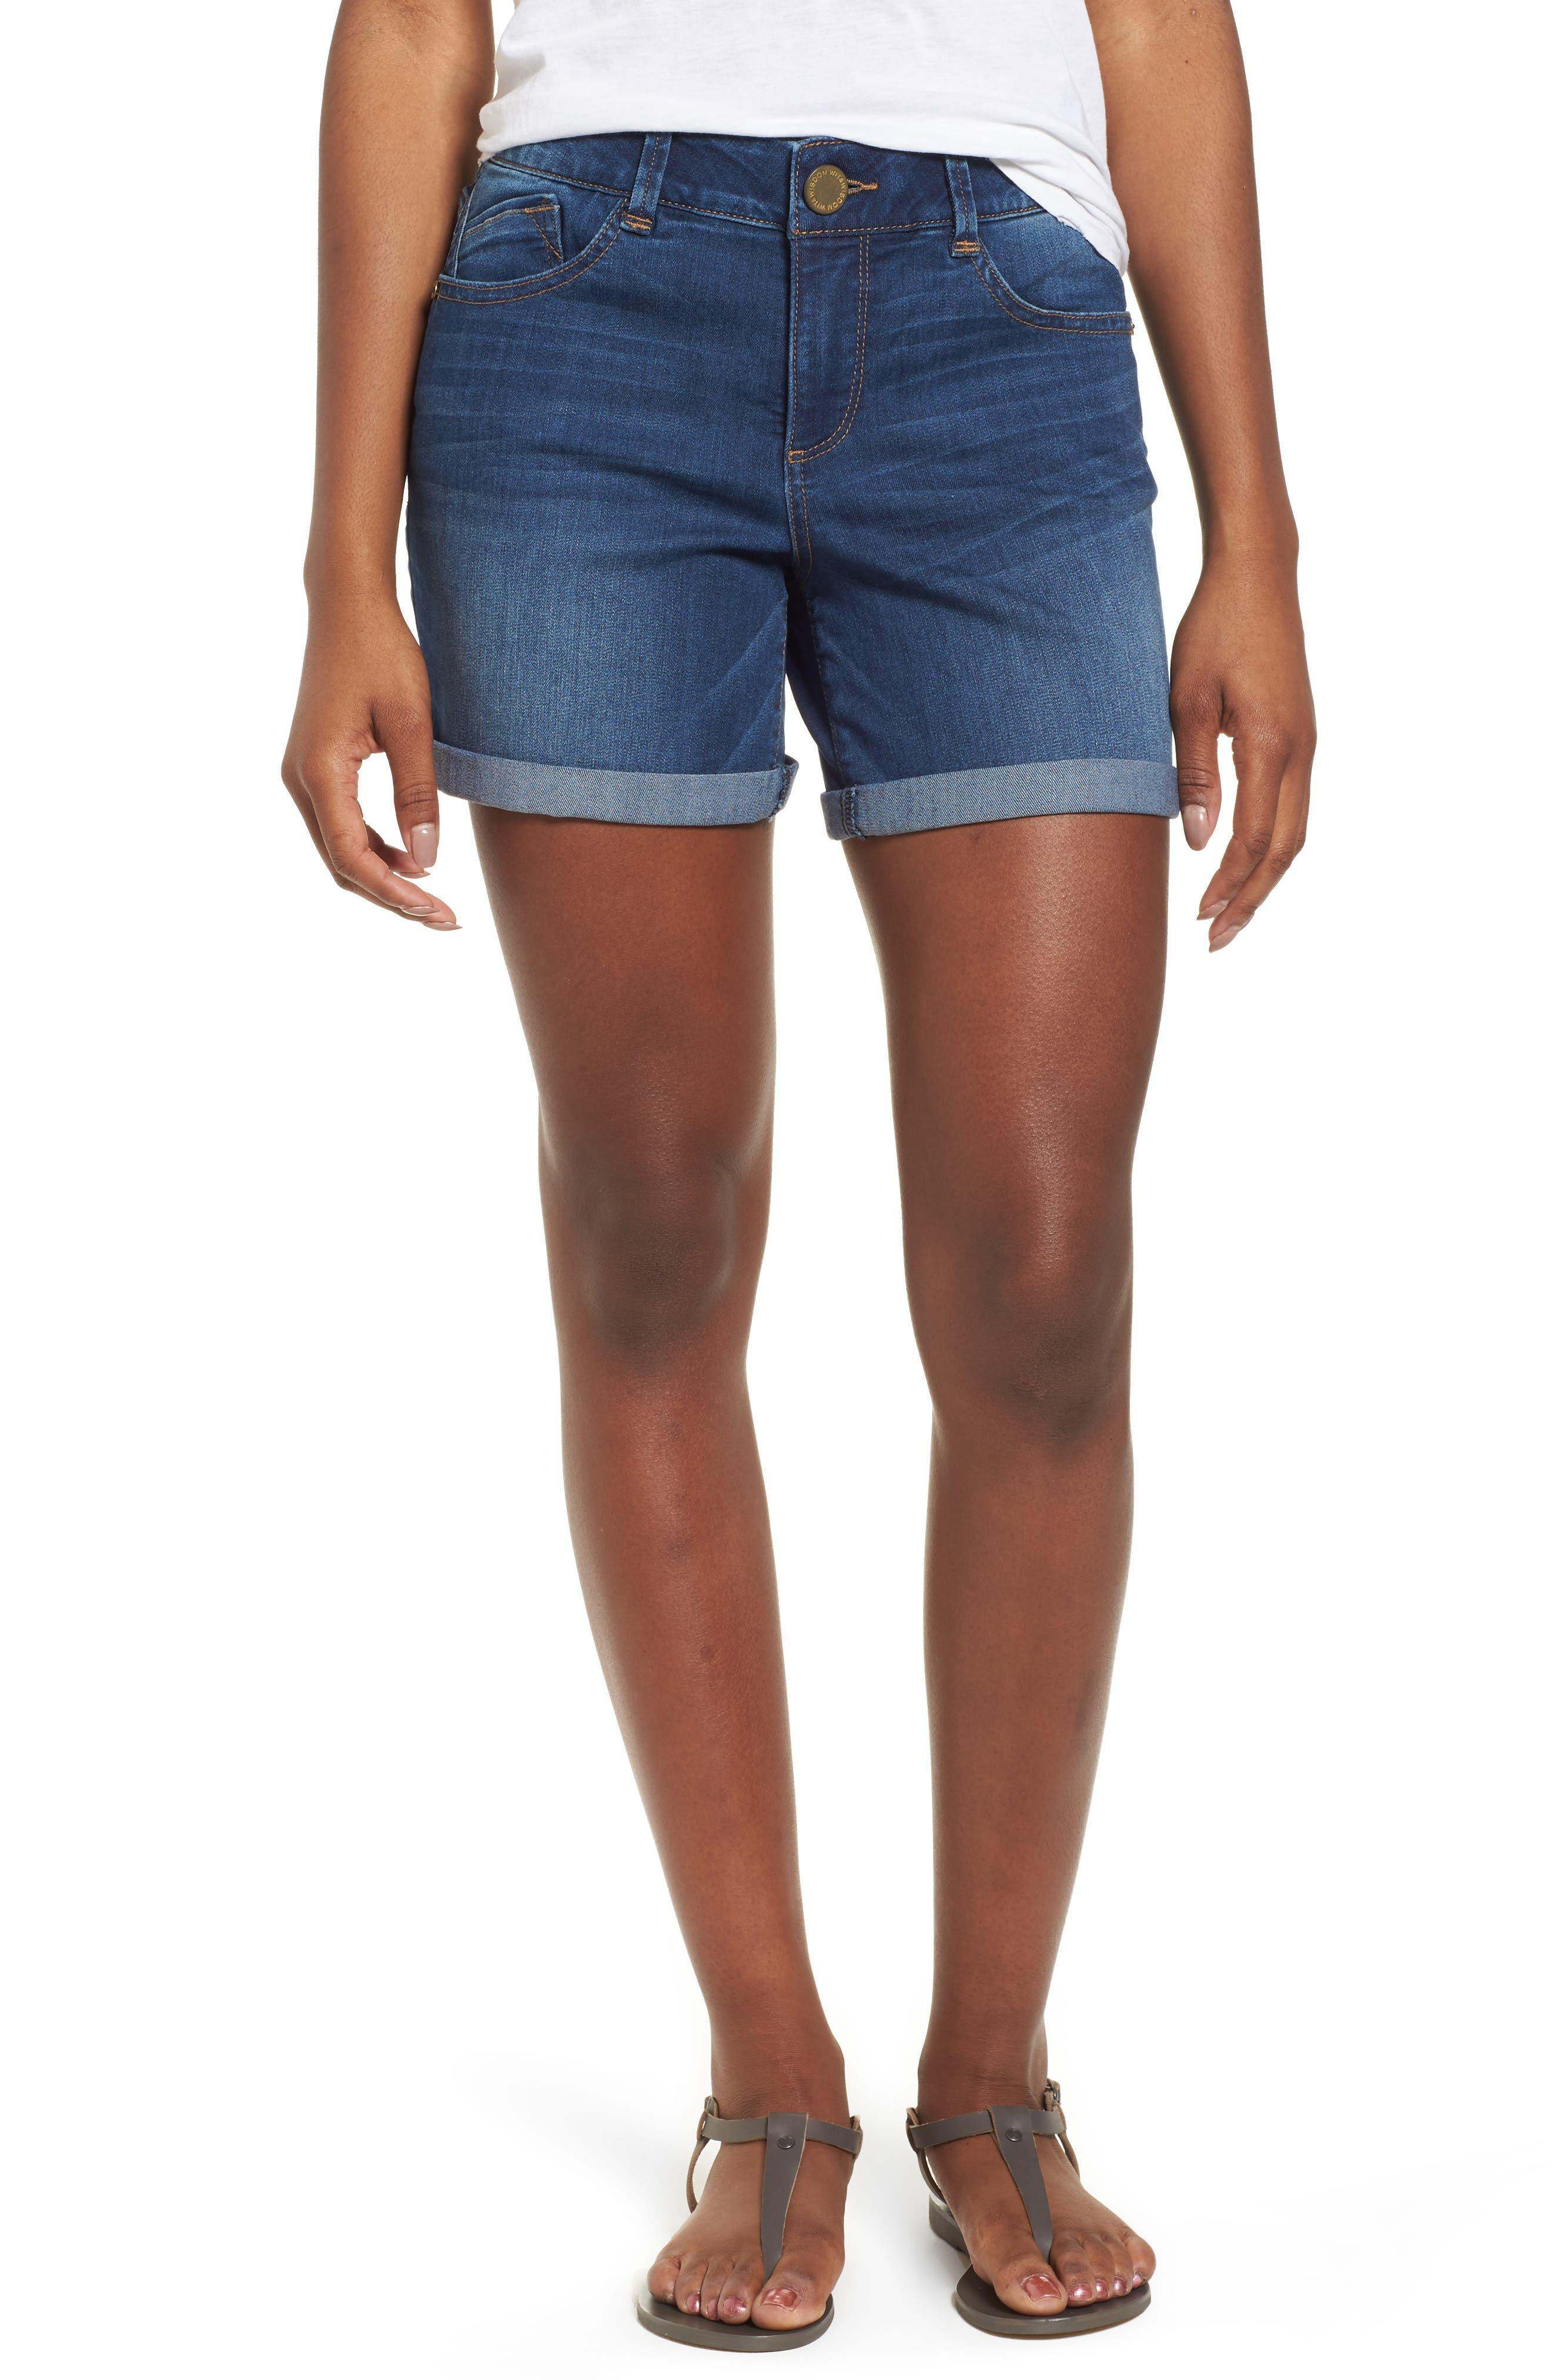 Main Image - Wit & Wisdom Ab-solution Cuffed Denim Shorts (Regular & Petite) (Nordstrom Exclusive)